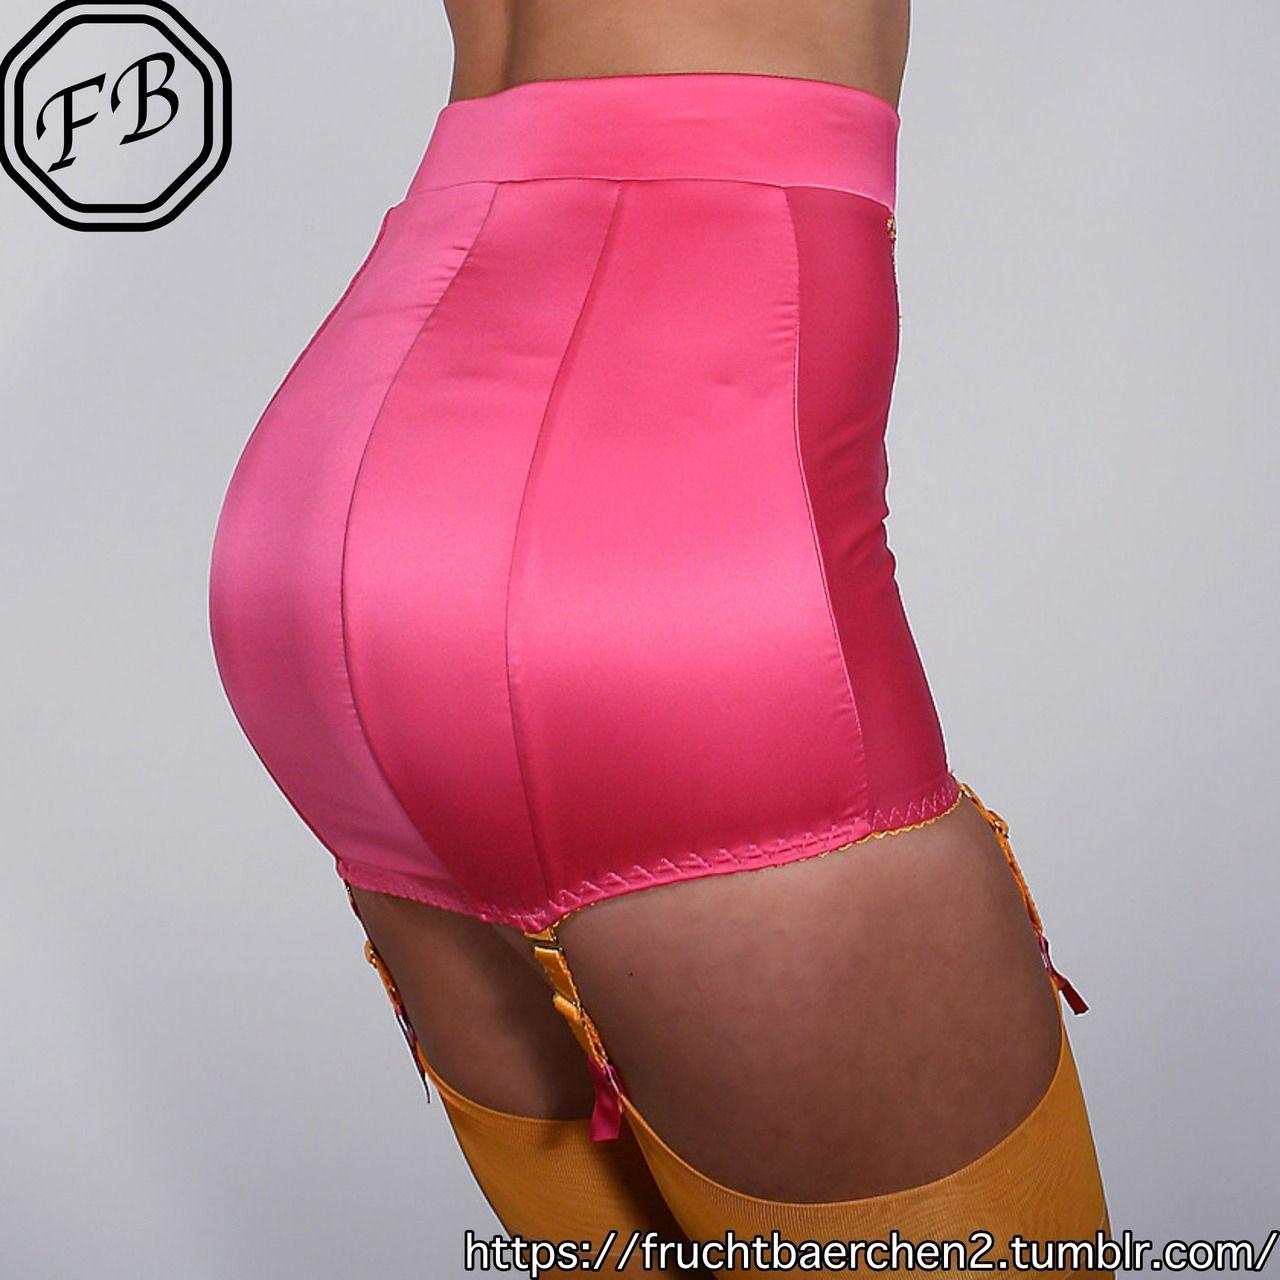 Cucky pink lingerie